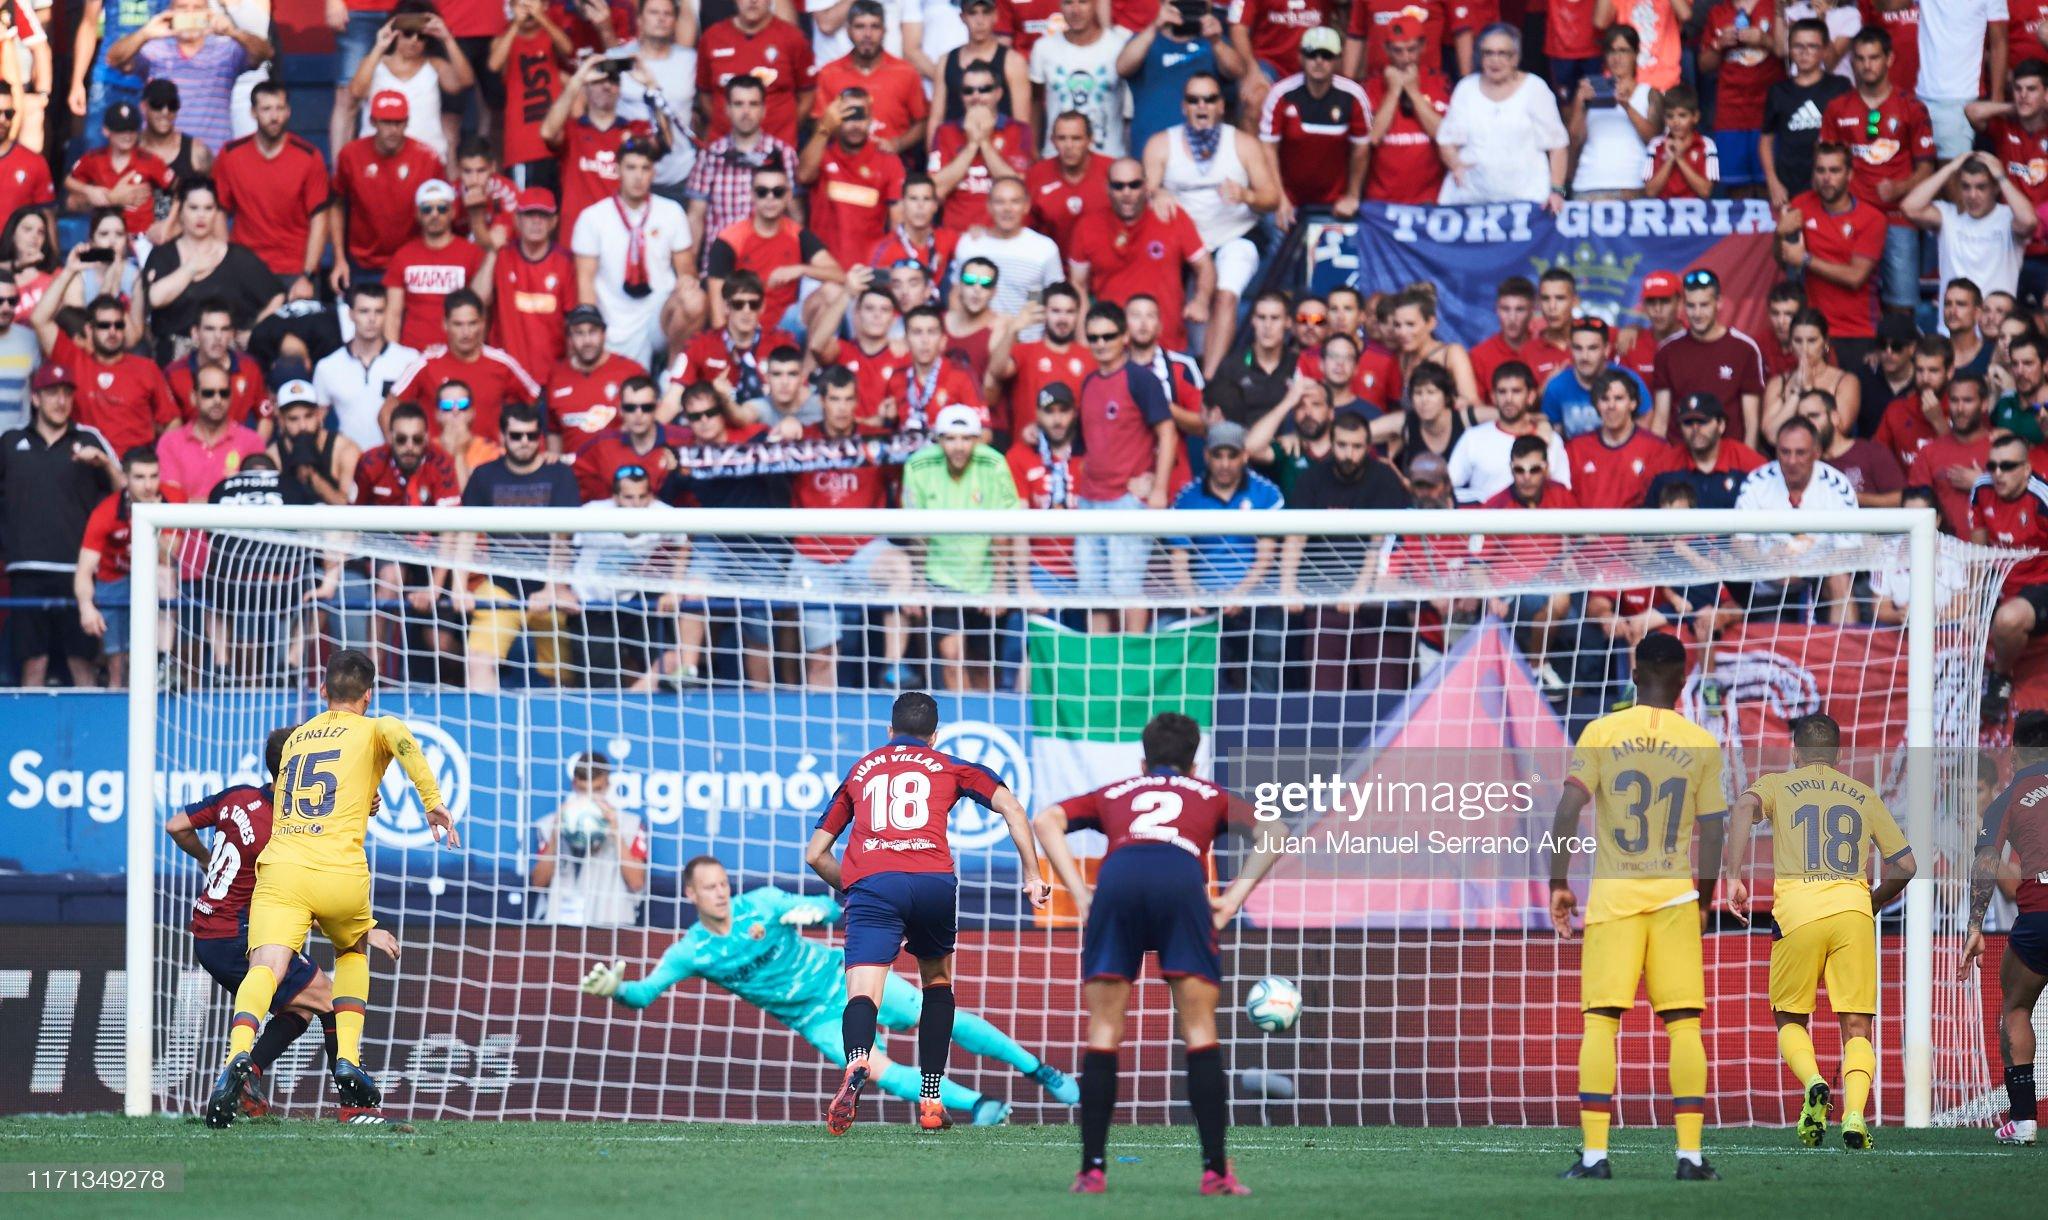 صور مباراة : أوساسونا - برشلونة 2-2 ( 31-08-2019 )  Roberto-torres-of-ca-osasuna-scores-his-teams-second-goal-during-the-picture-id1171349278?s=2048x2048